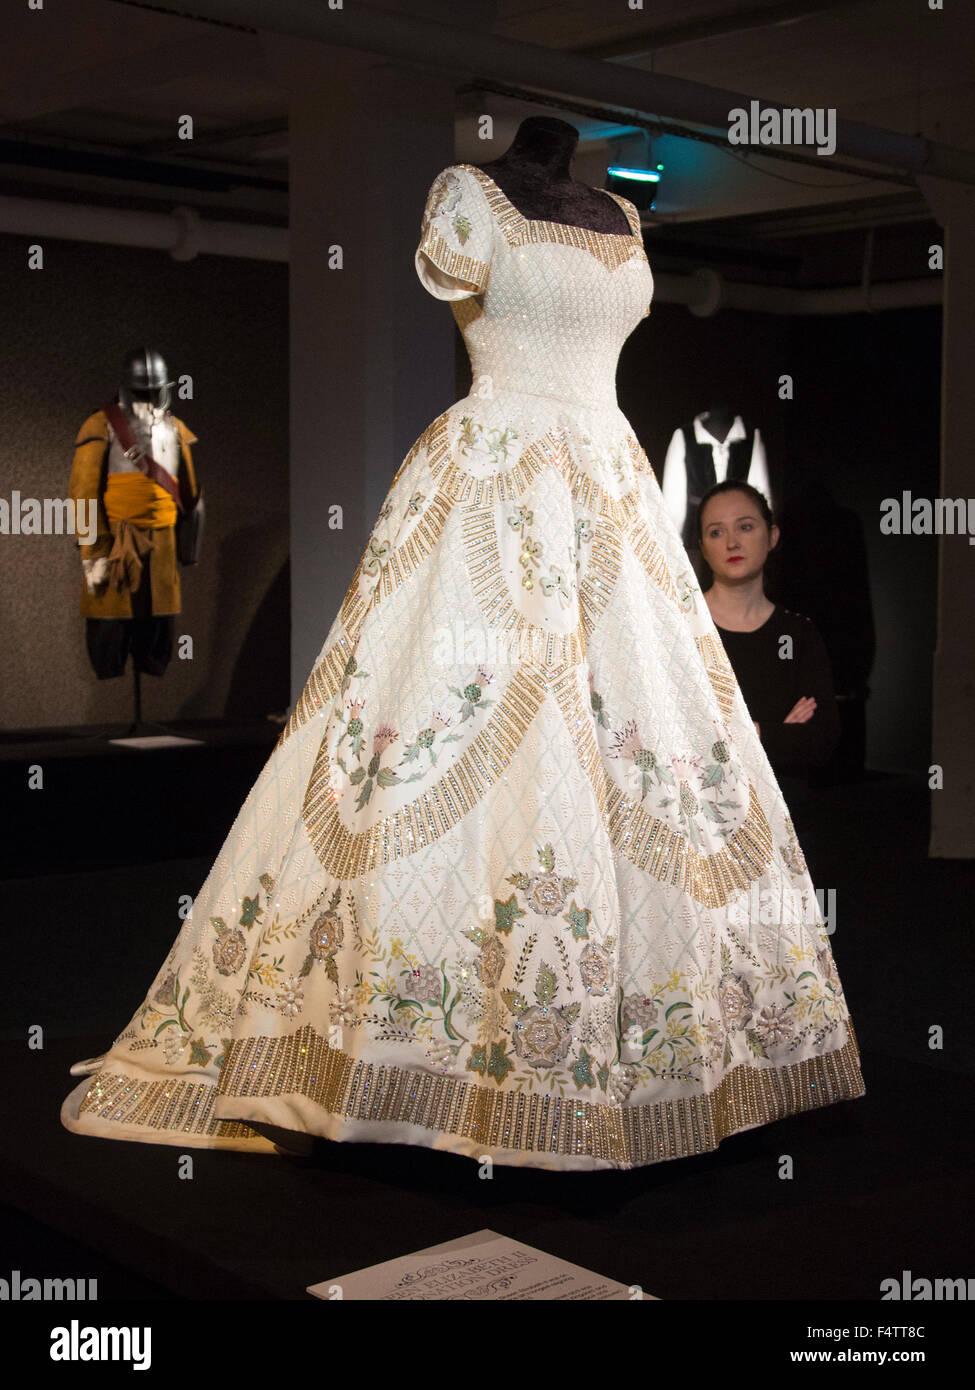 London, UK. 22/10/2015. Replica of Queen Elizabeth II Coronation ...